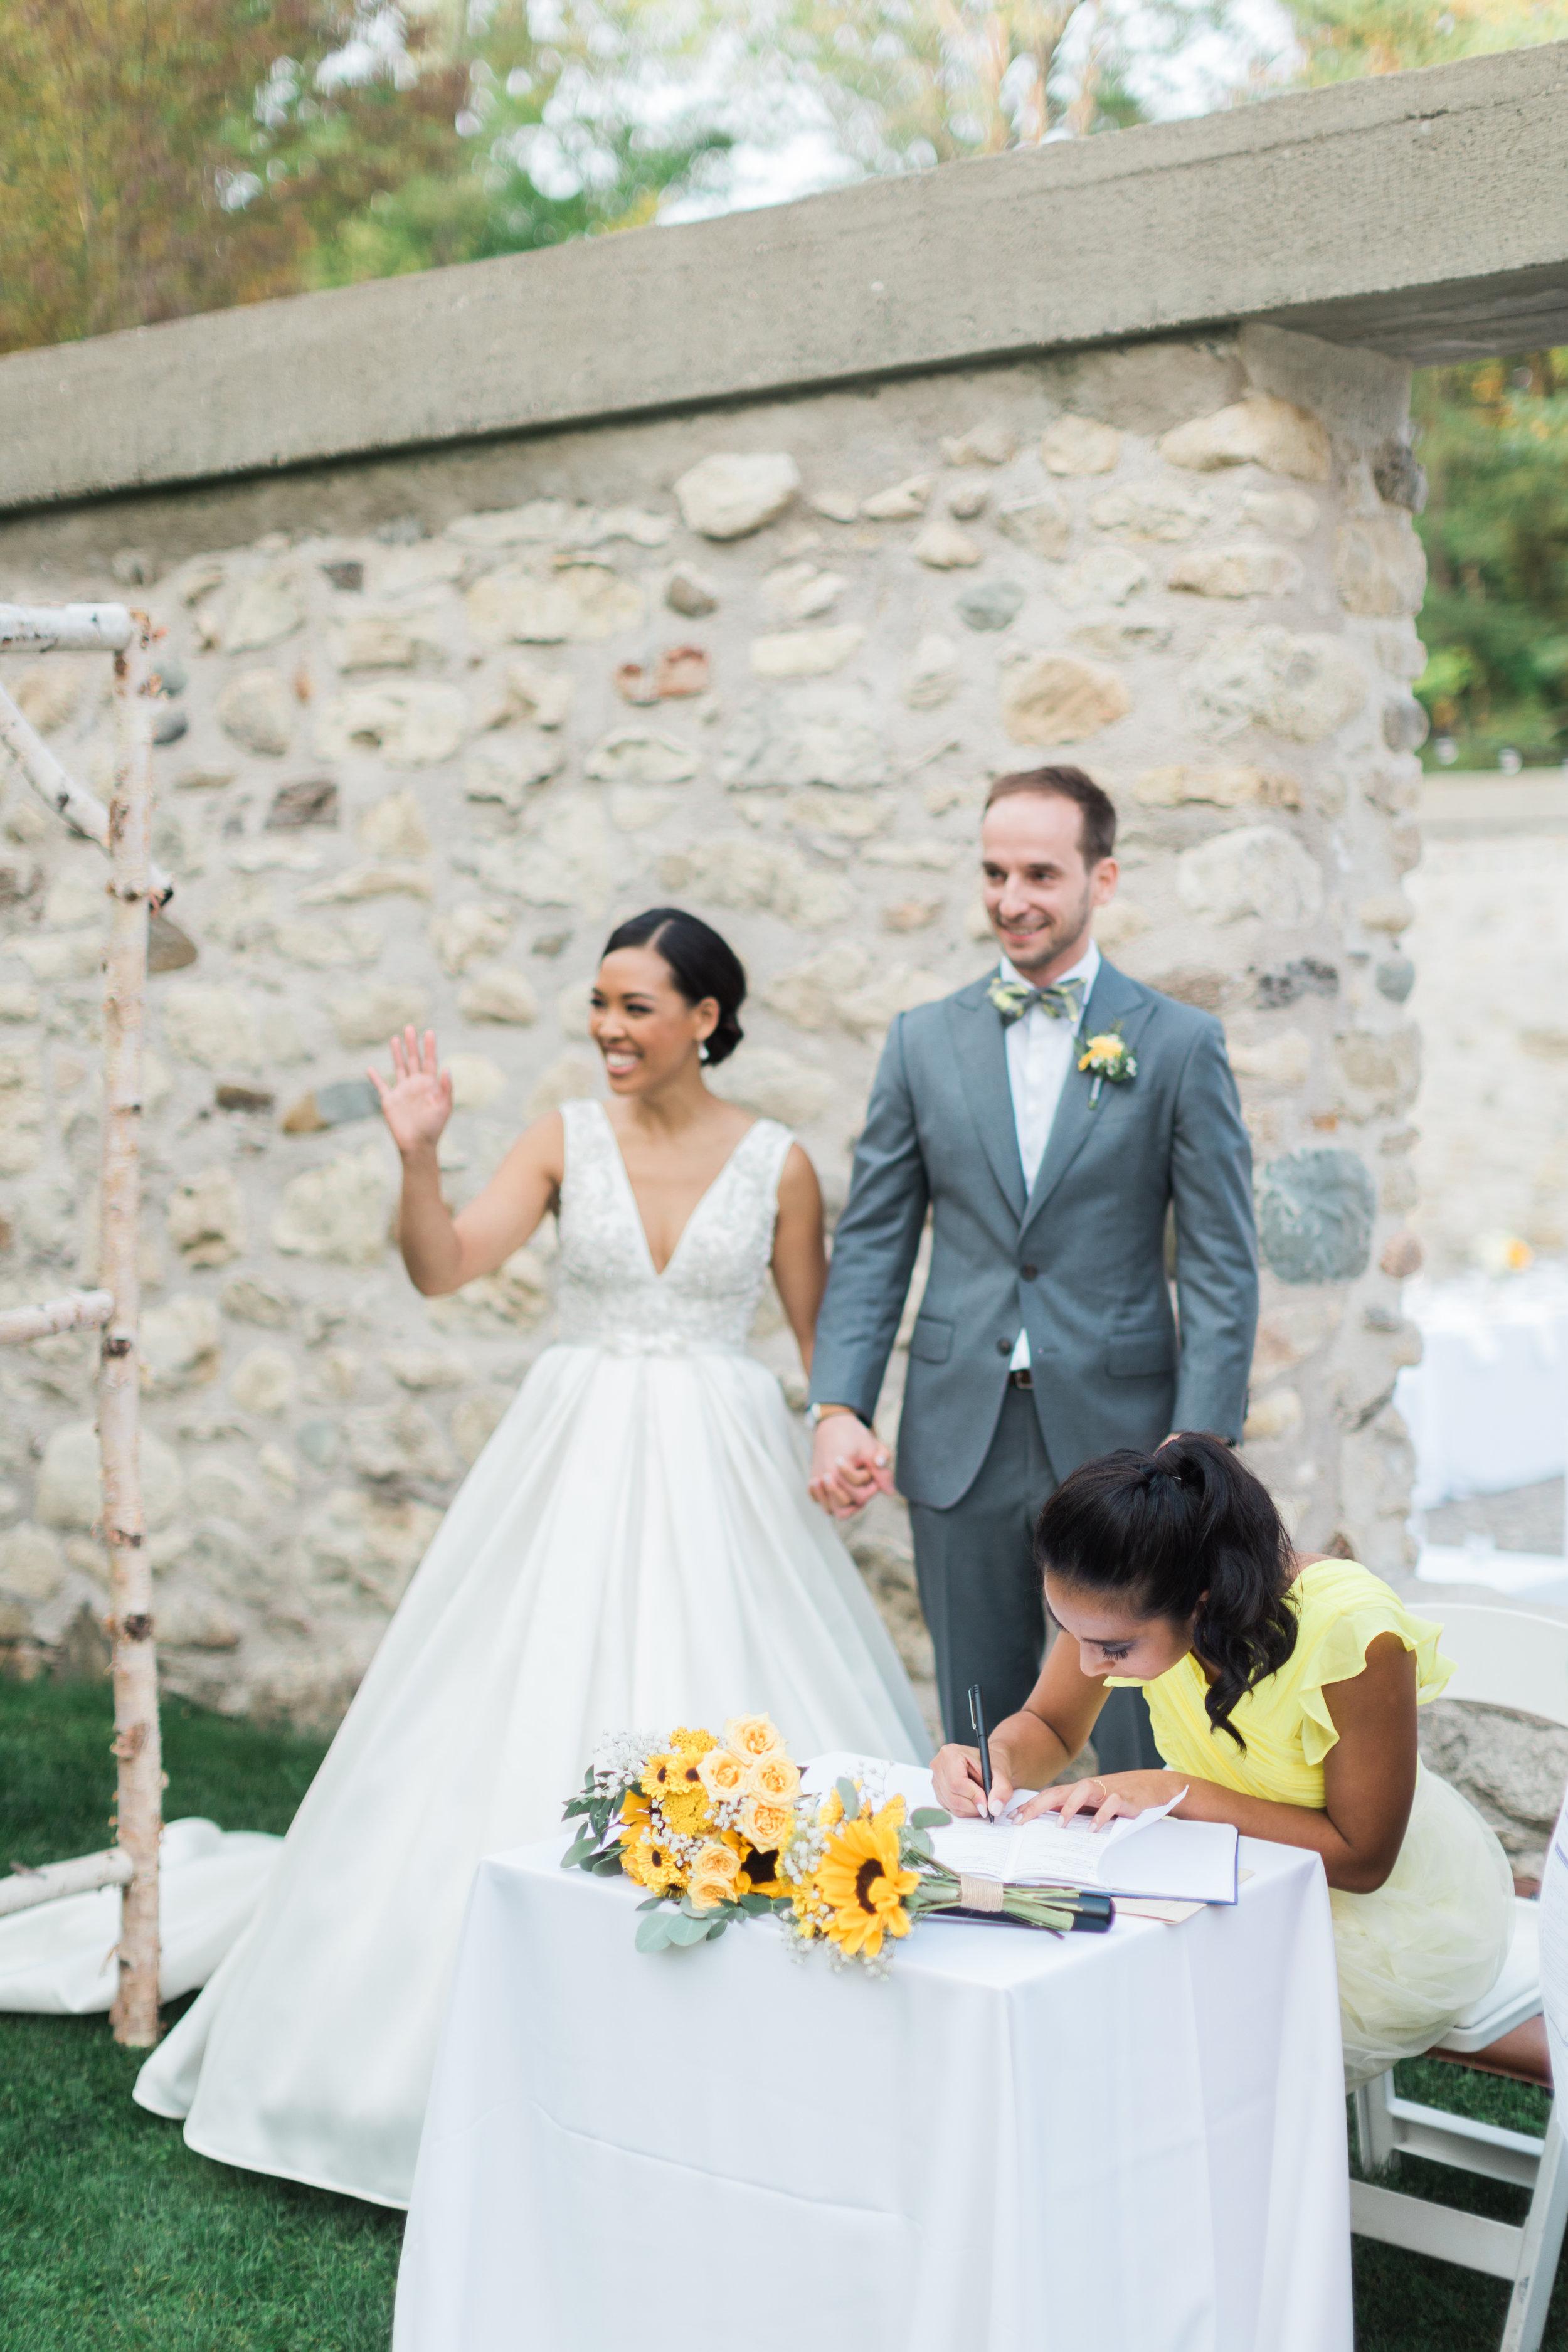 Alton Mills Wedding - Ceremony-75.jpg